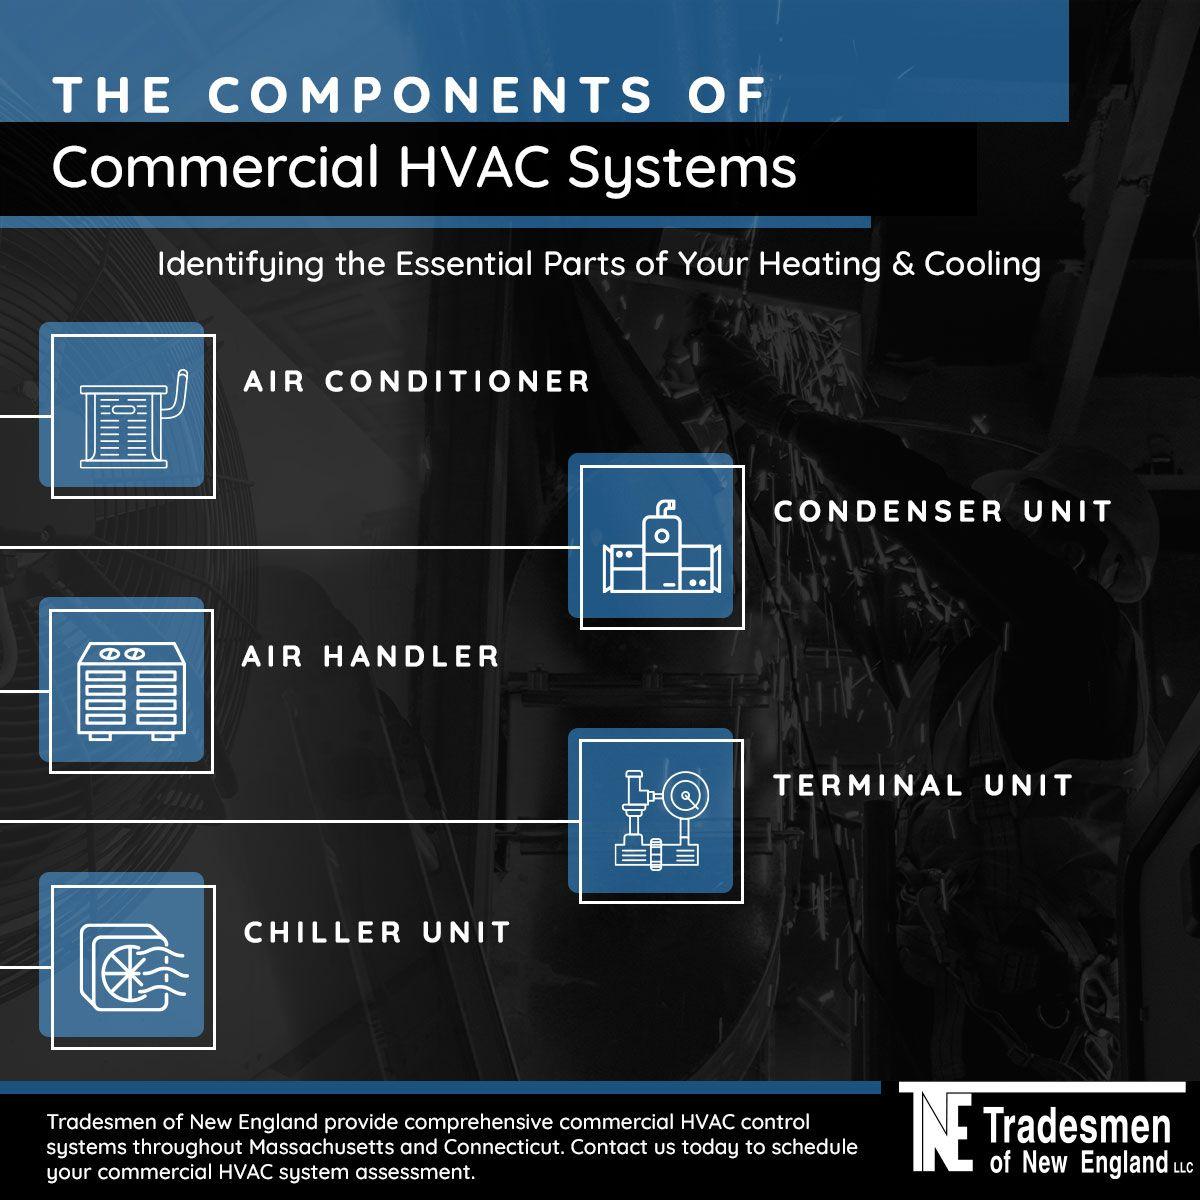 11.16.20_Commercial HVAC Systems.jpg